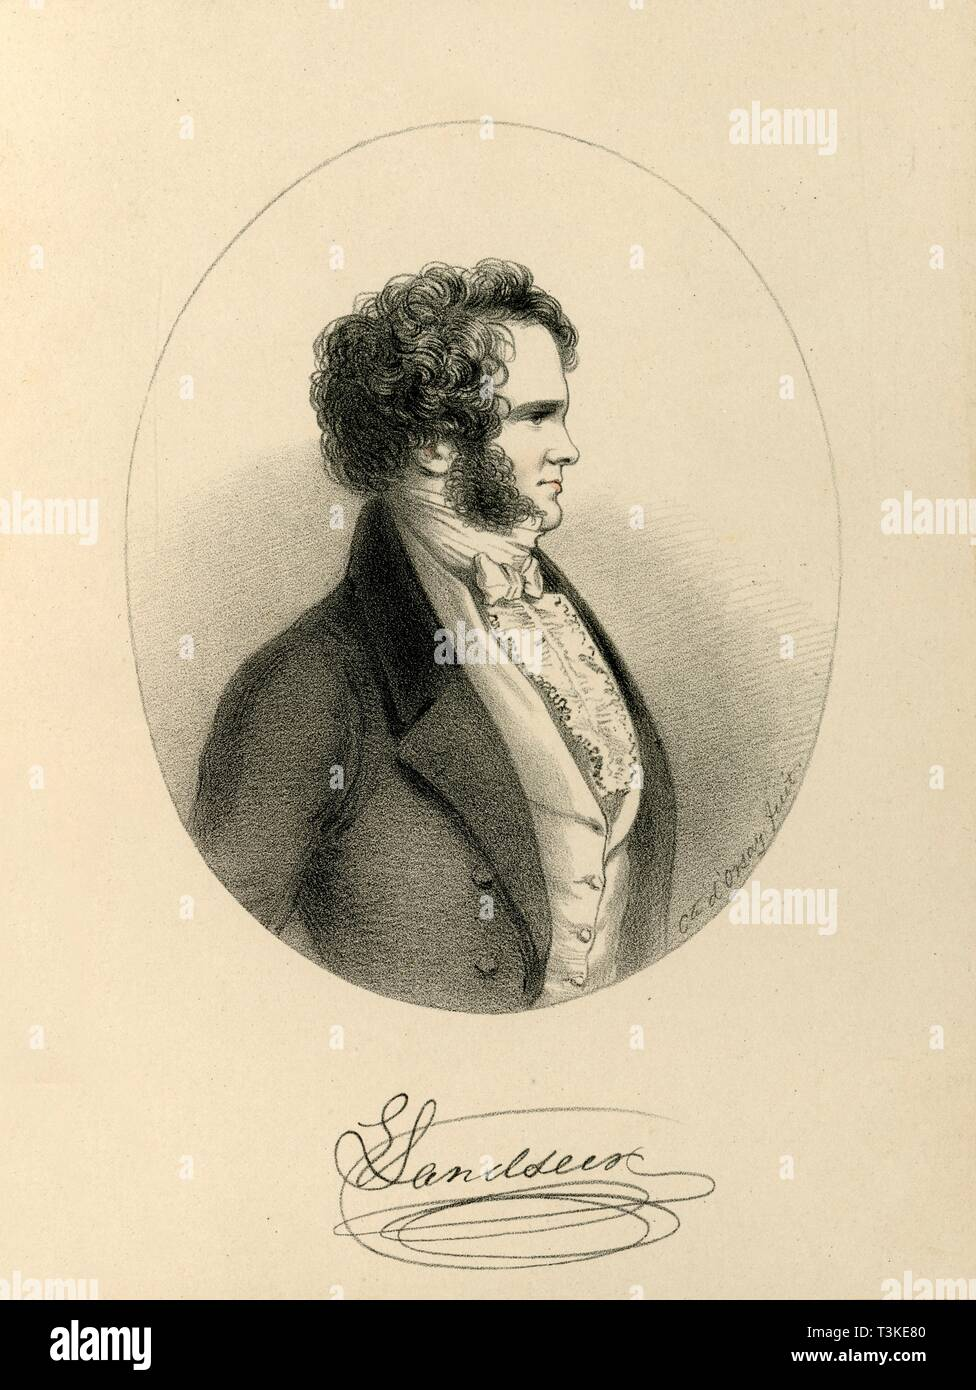 'E. Landseer', c1843. Creator: Richard James Lane. - Stock Image